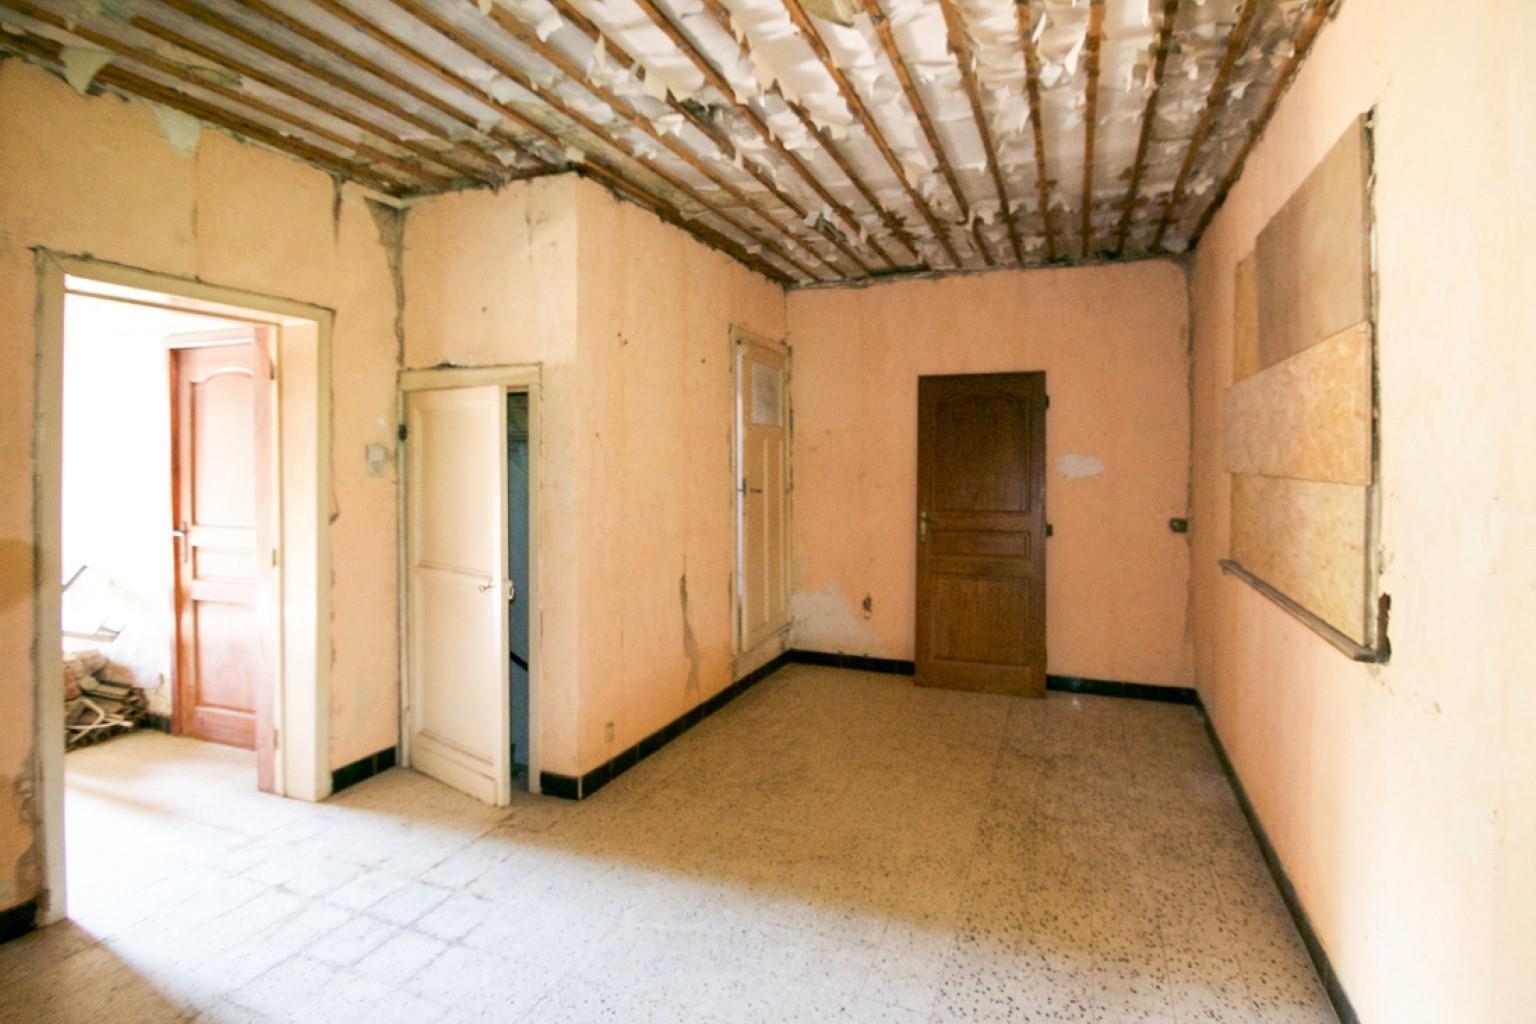 Maison - Leval-Trahegnies - #3170170-5